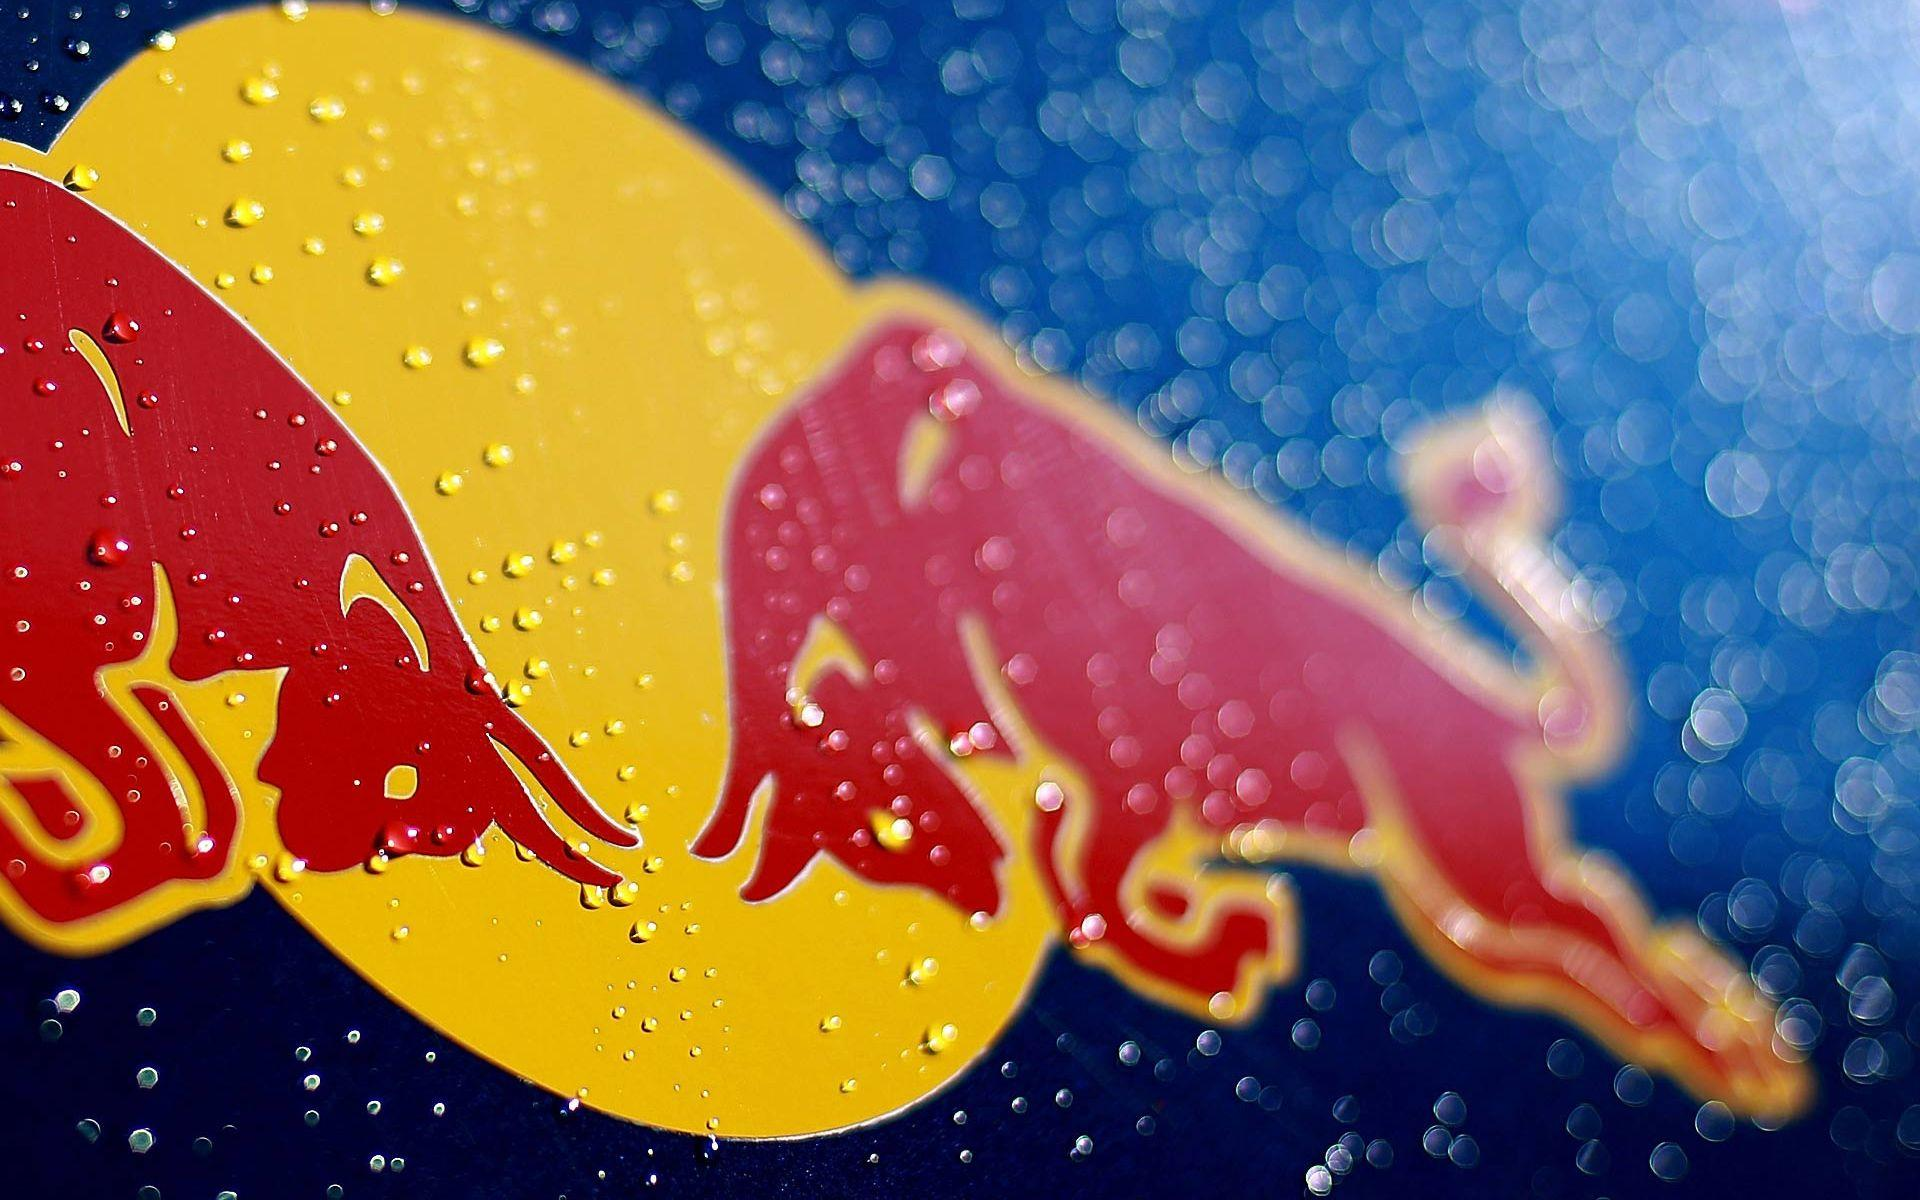 Red Bull Wallpapers HD - Wallpaper Cave